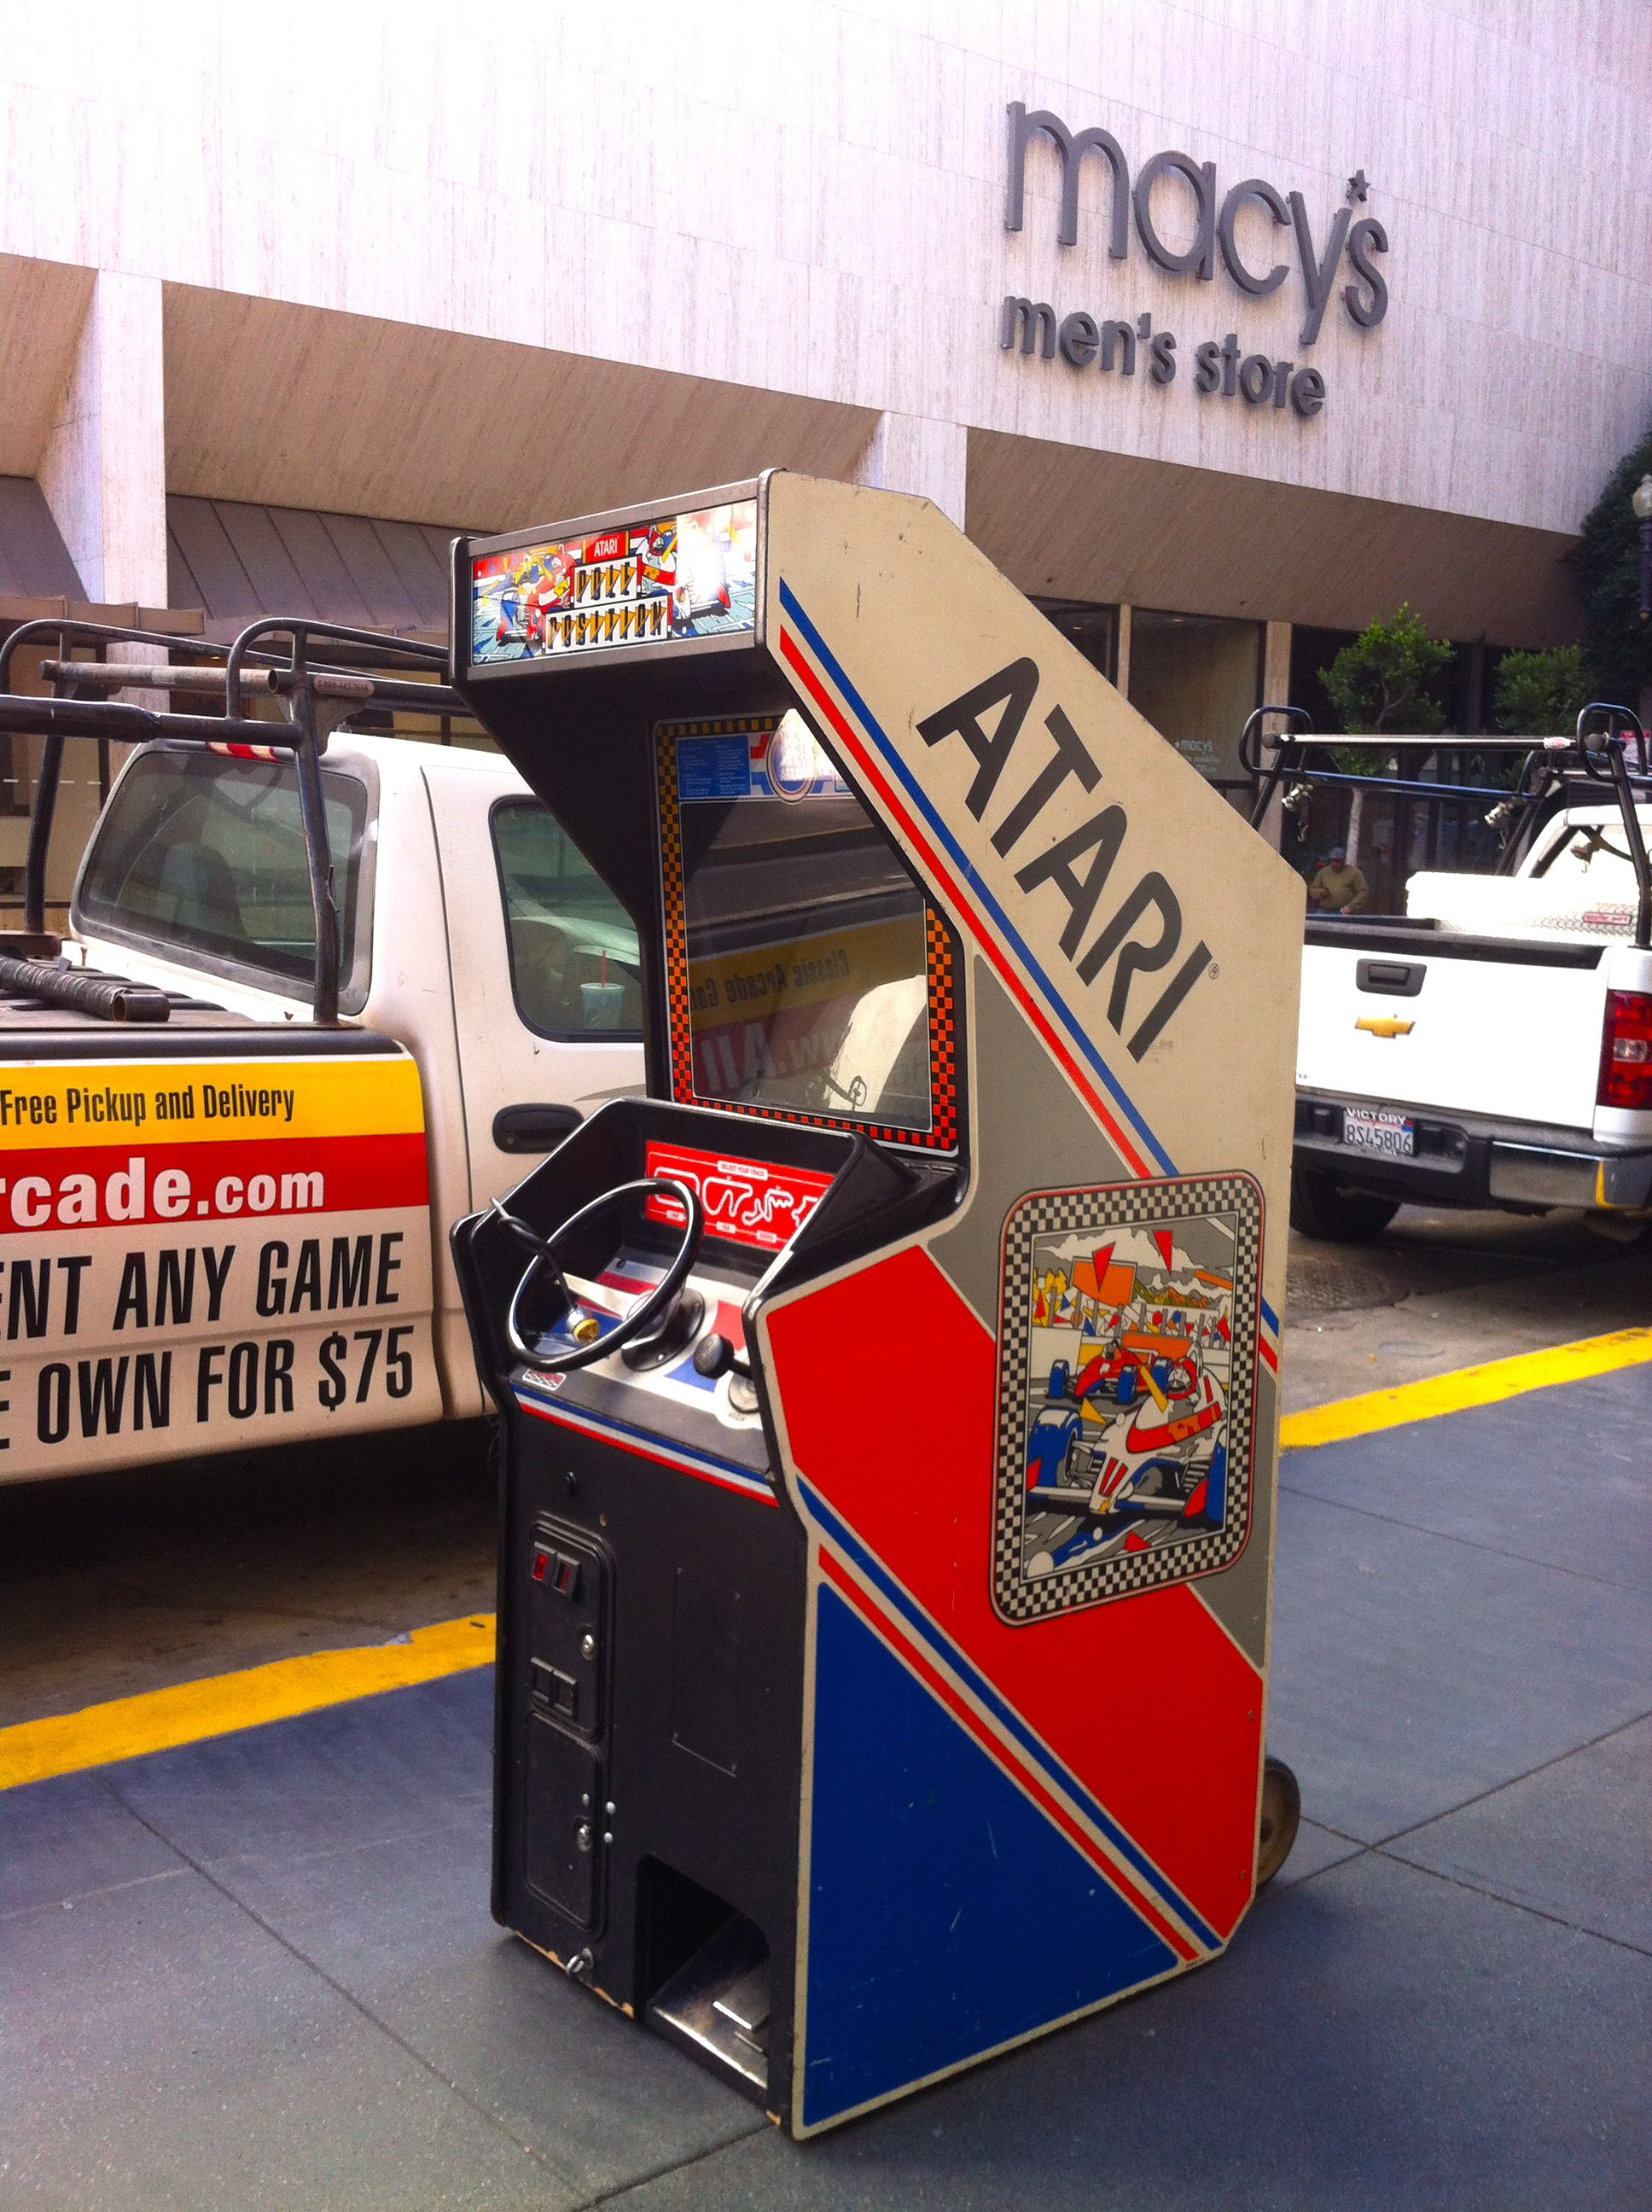 Atari meets Macy's sanfrancisco atari Men store